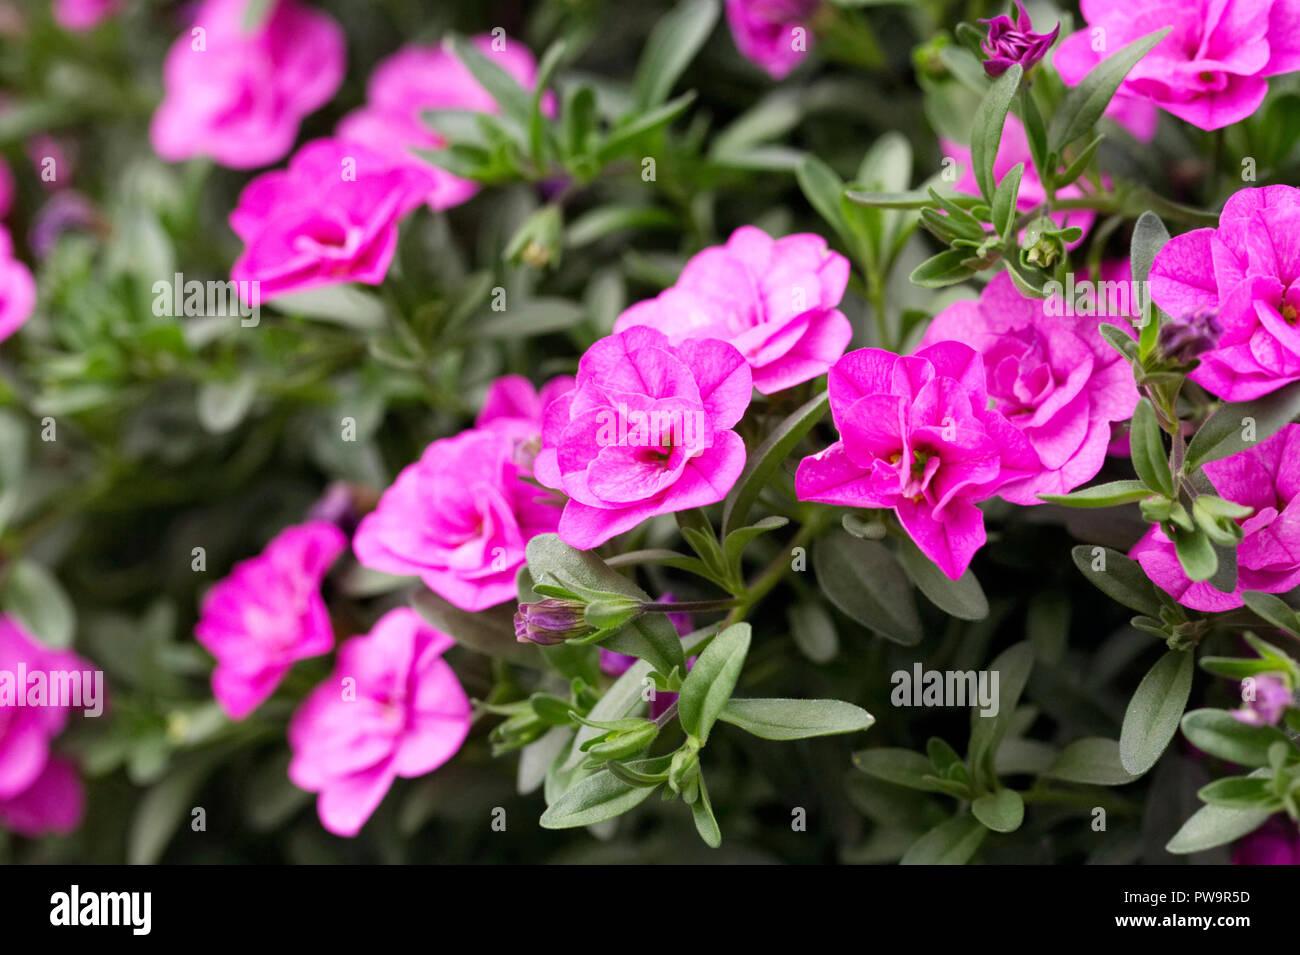 Calibrachoa Can Can Double 'Pinkmania' flowers. - Stock Image